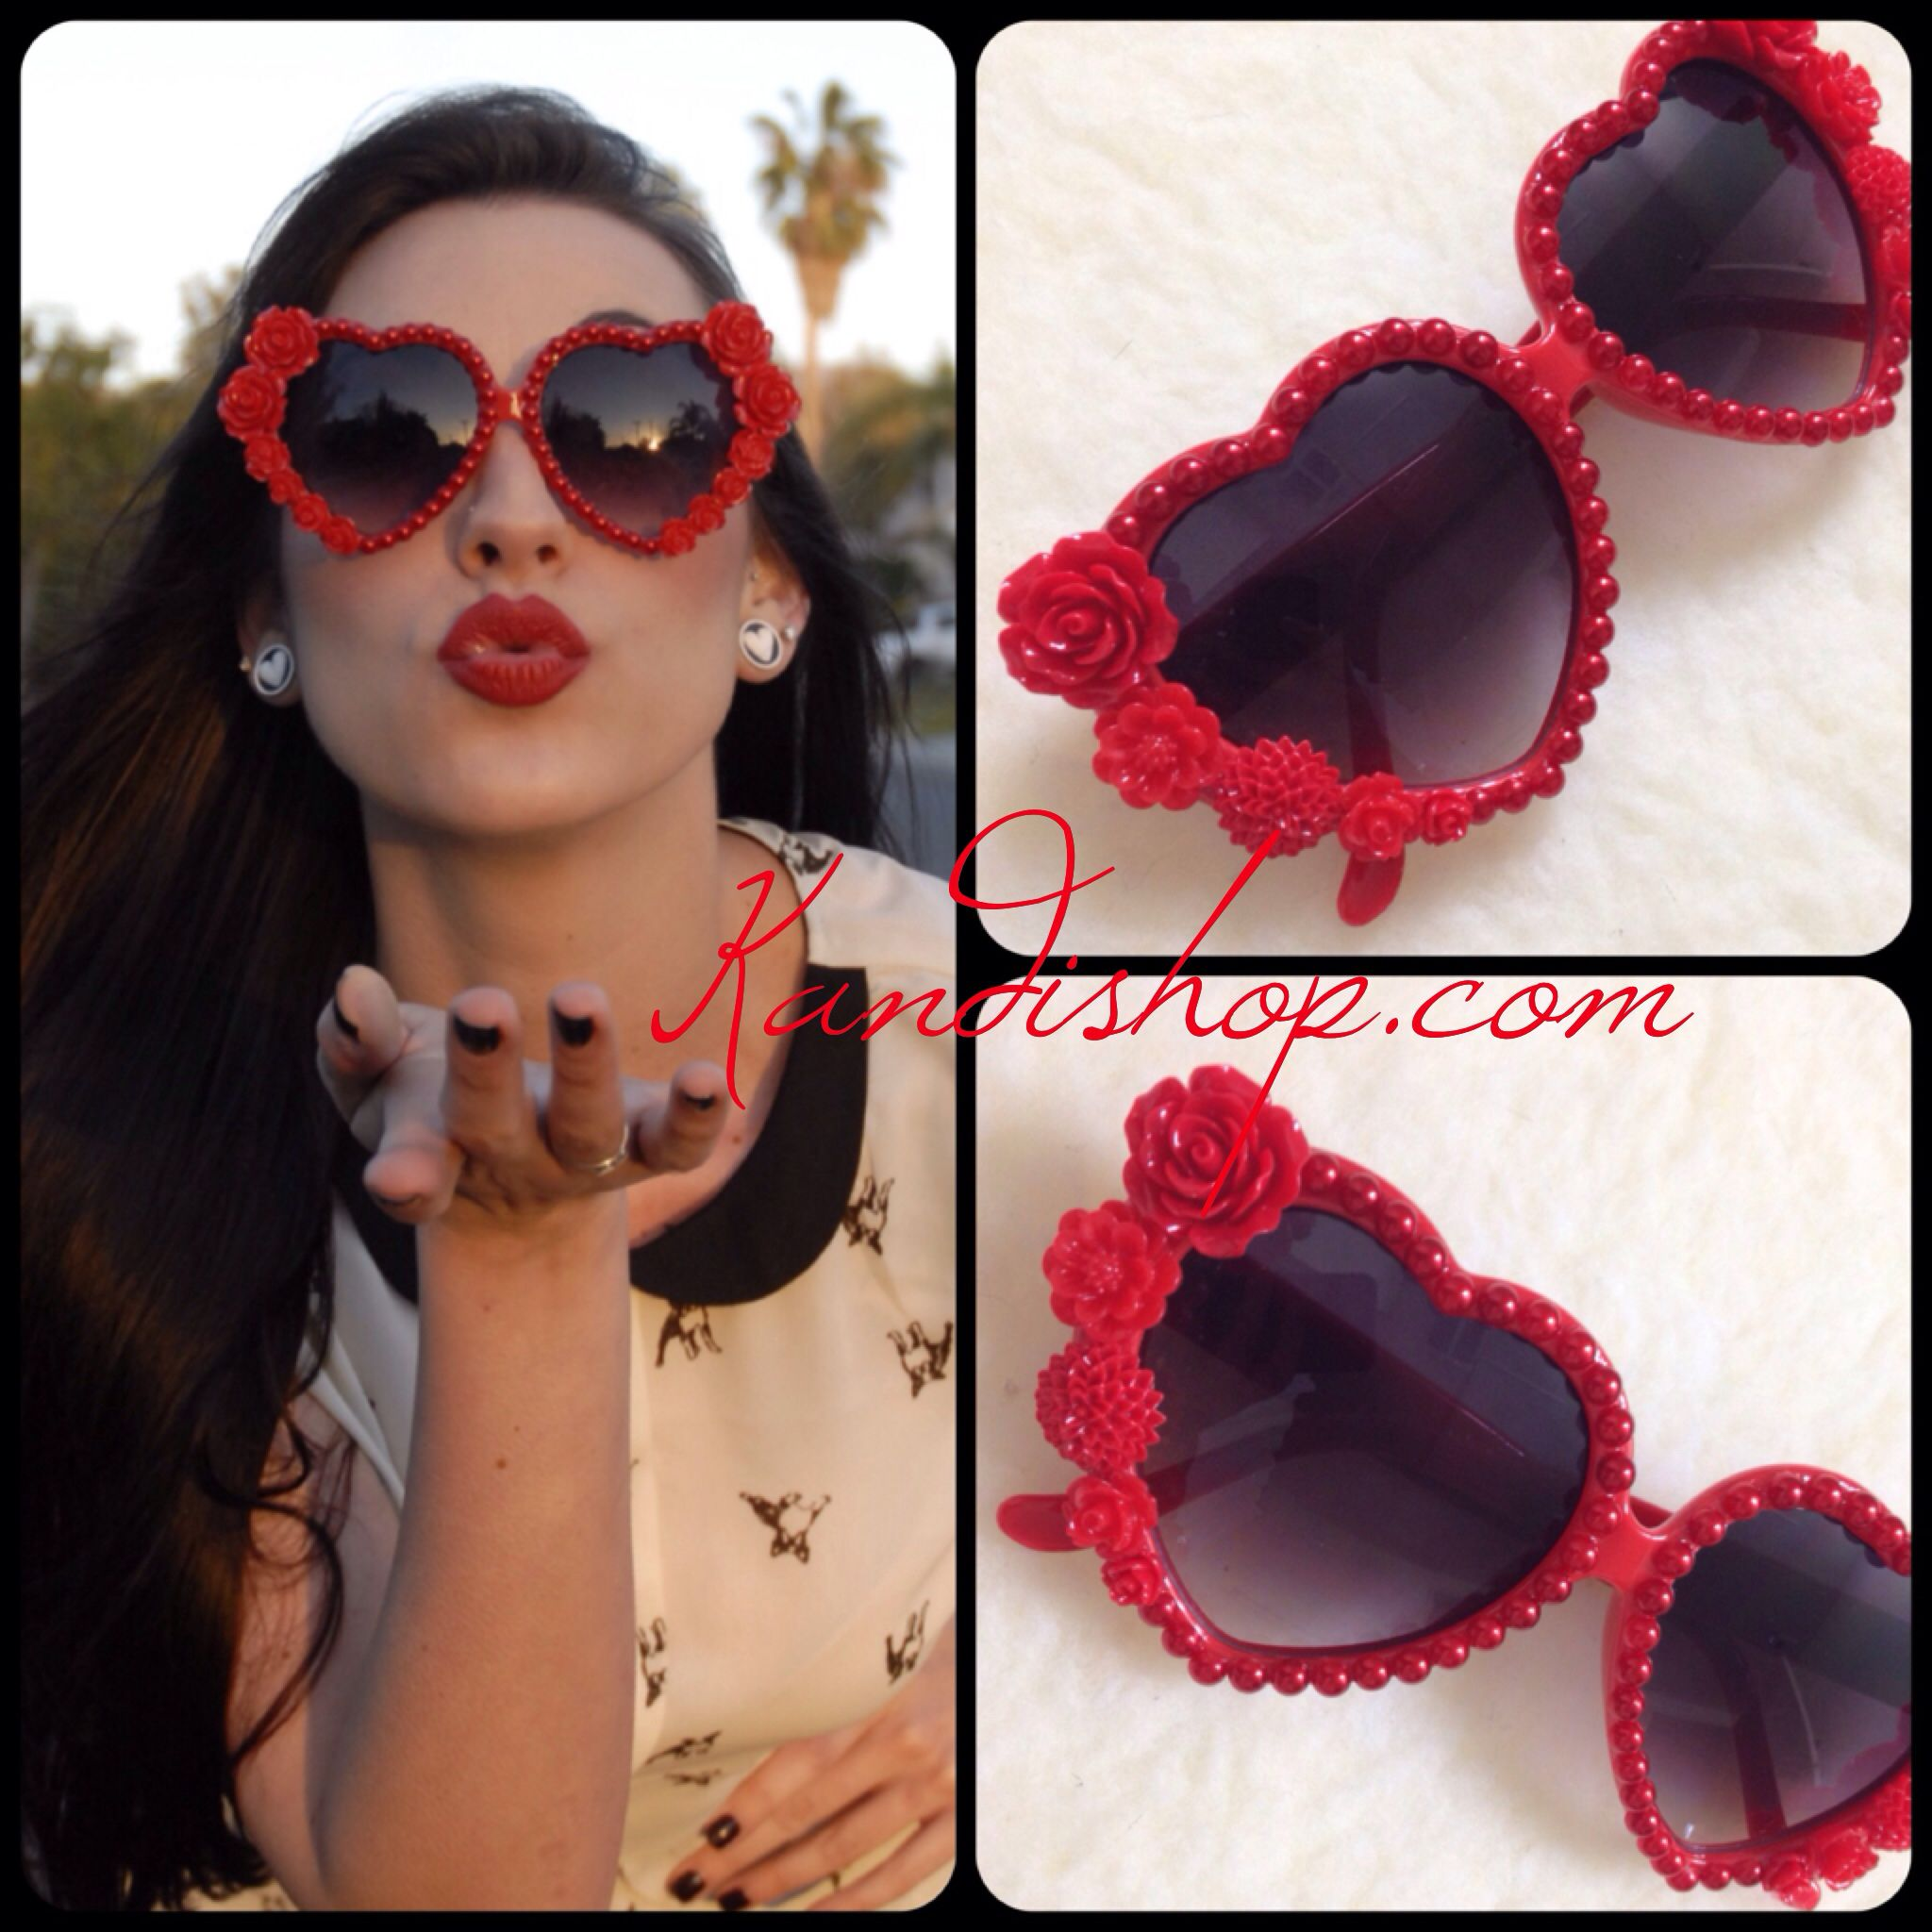 335eda85ee Red floral heart shaped sunglasses at kandishop.com!